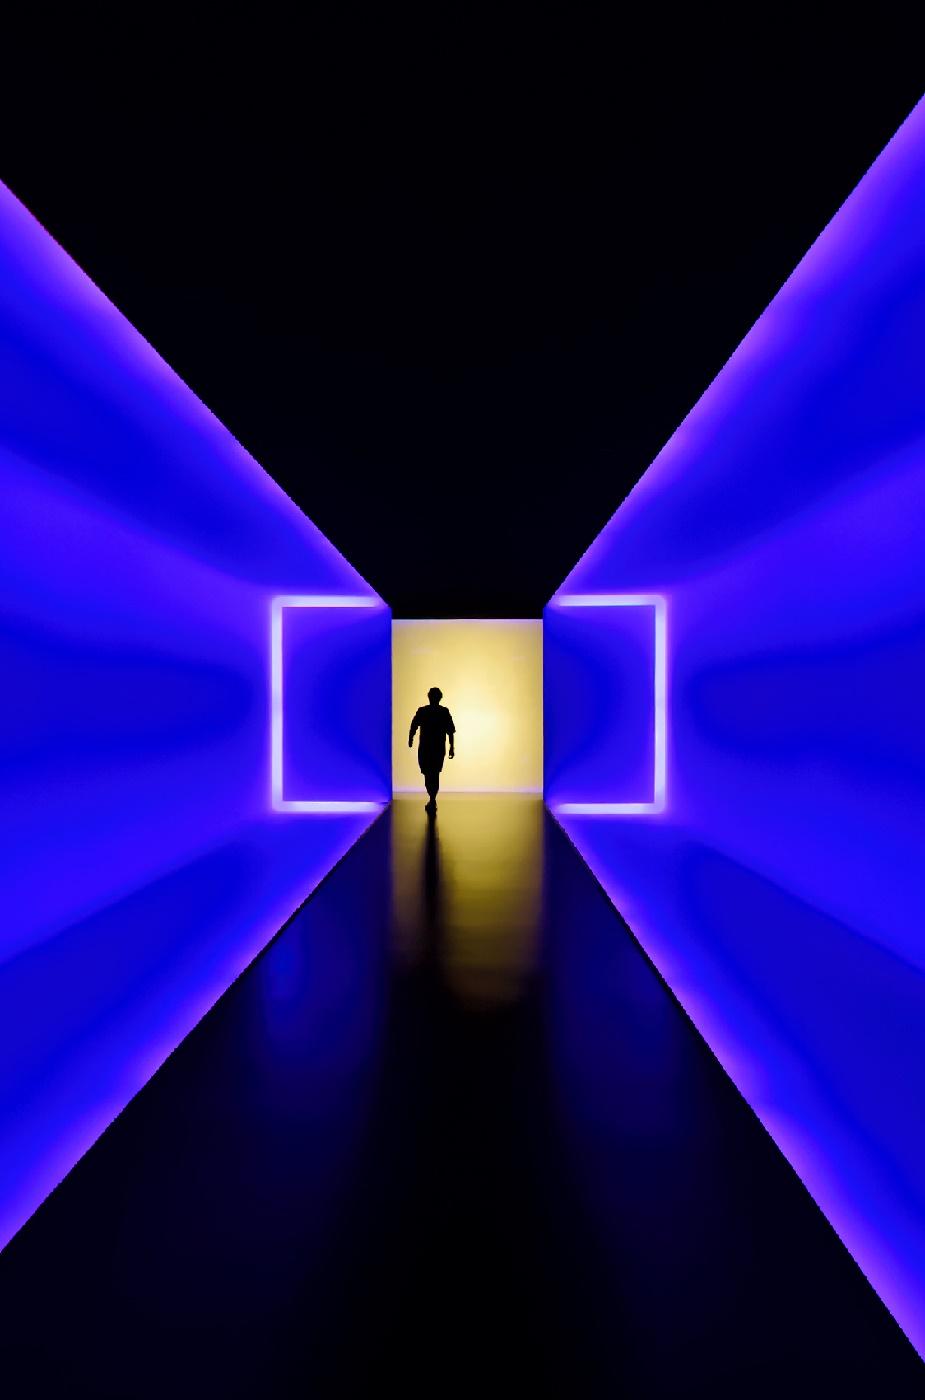 Into The Heart XV ~ The Light Inside James Turrell